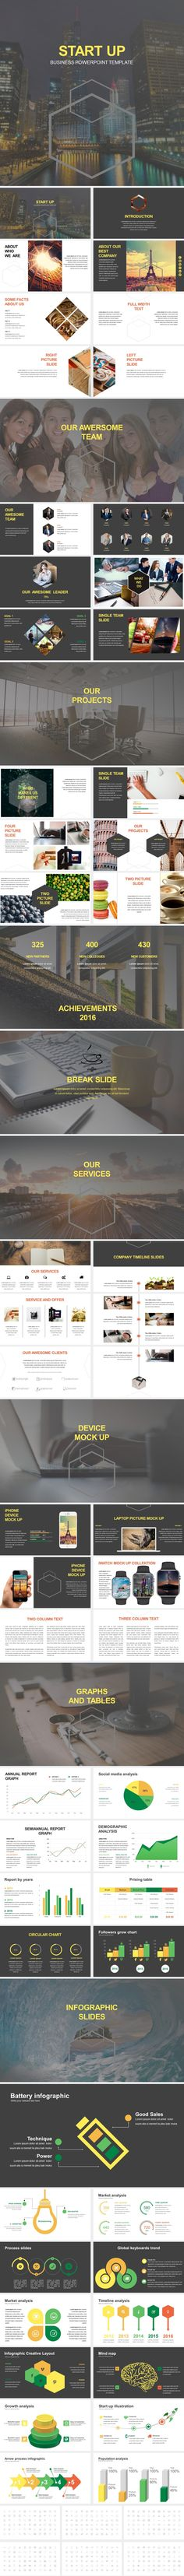 Company Profile Keynote Template Presentation Templates - profile company template